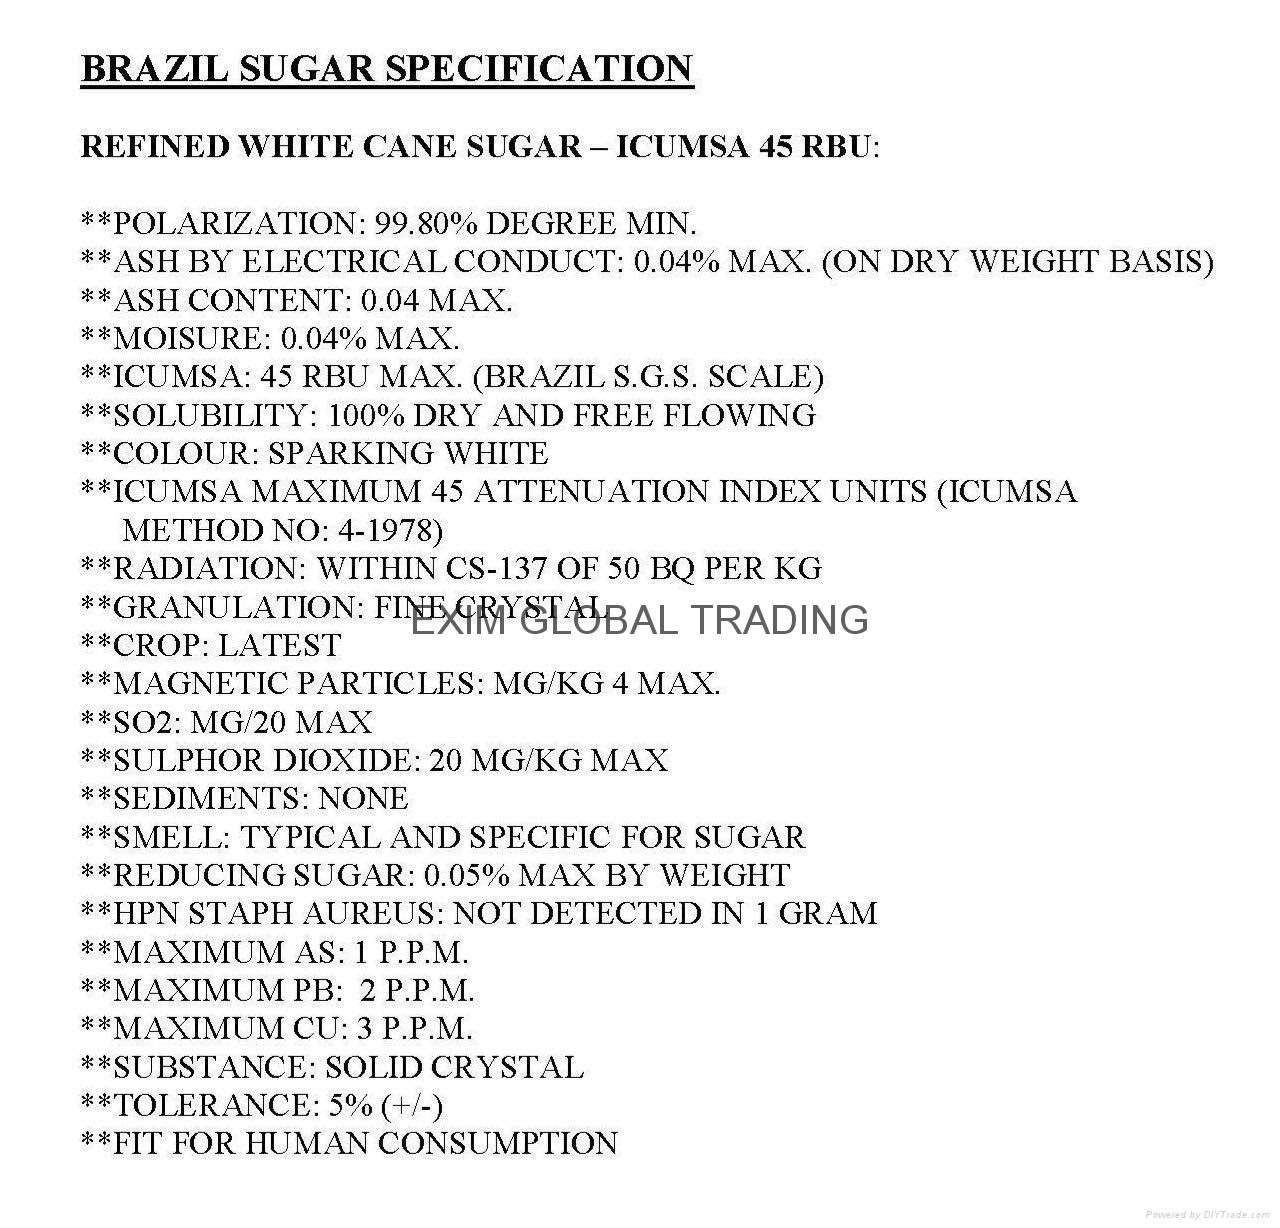 Refined White Cane Sugar - ICUMSA 45 RBU (Brazil) 5